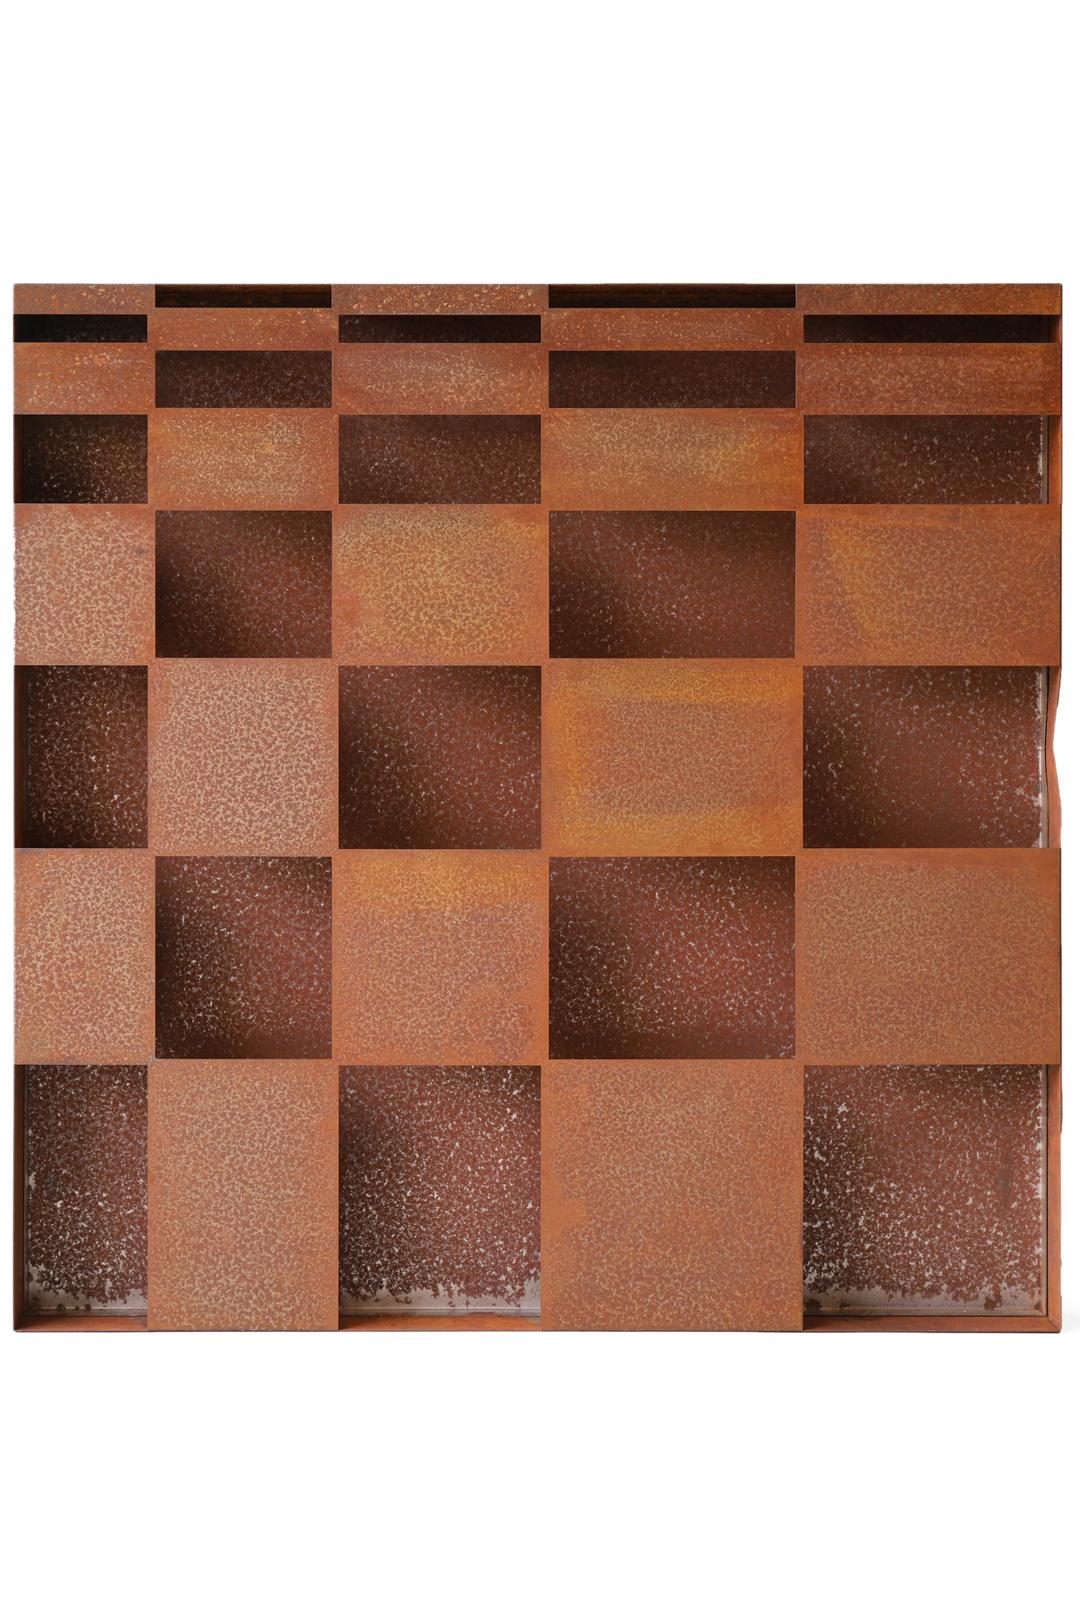 Modern Art Iron Panel/アート パネル アイアン モダン インテリア オブジェ